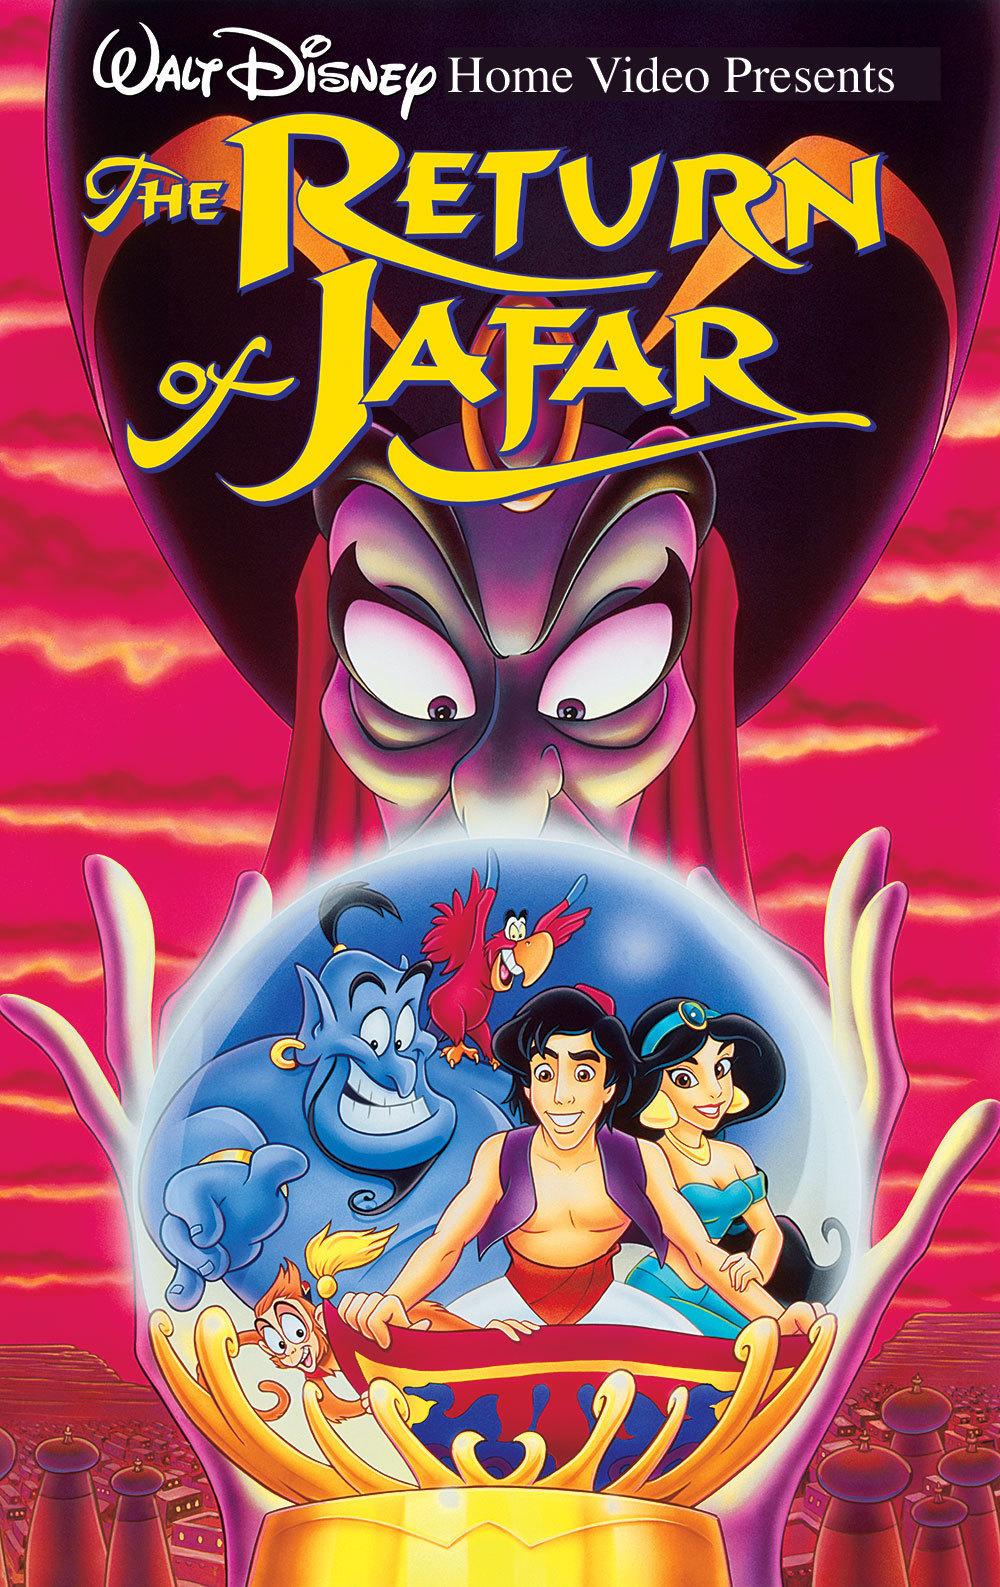 The Return of Jafar (video)